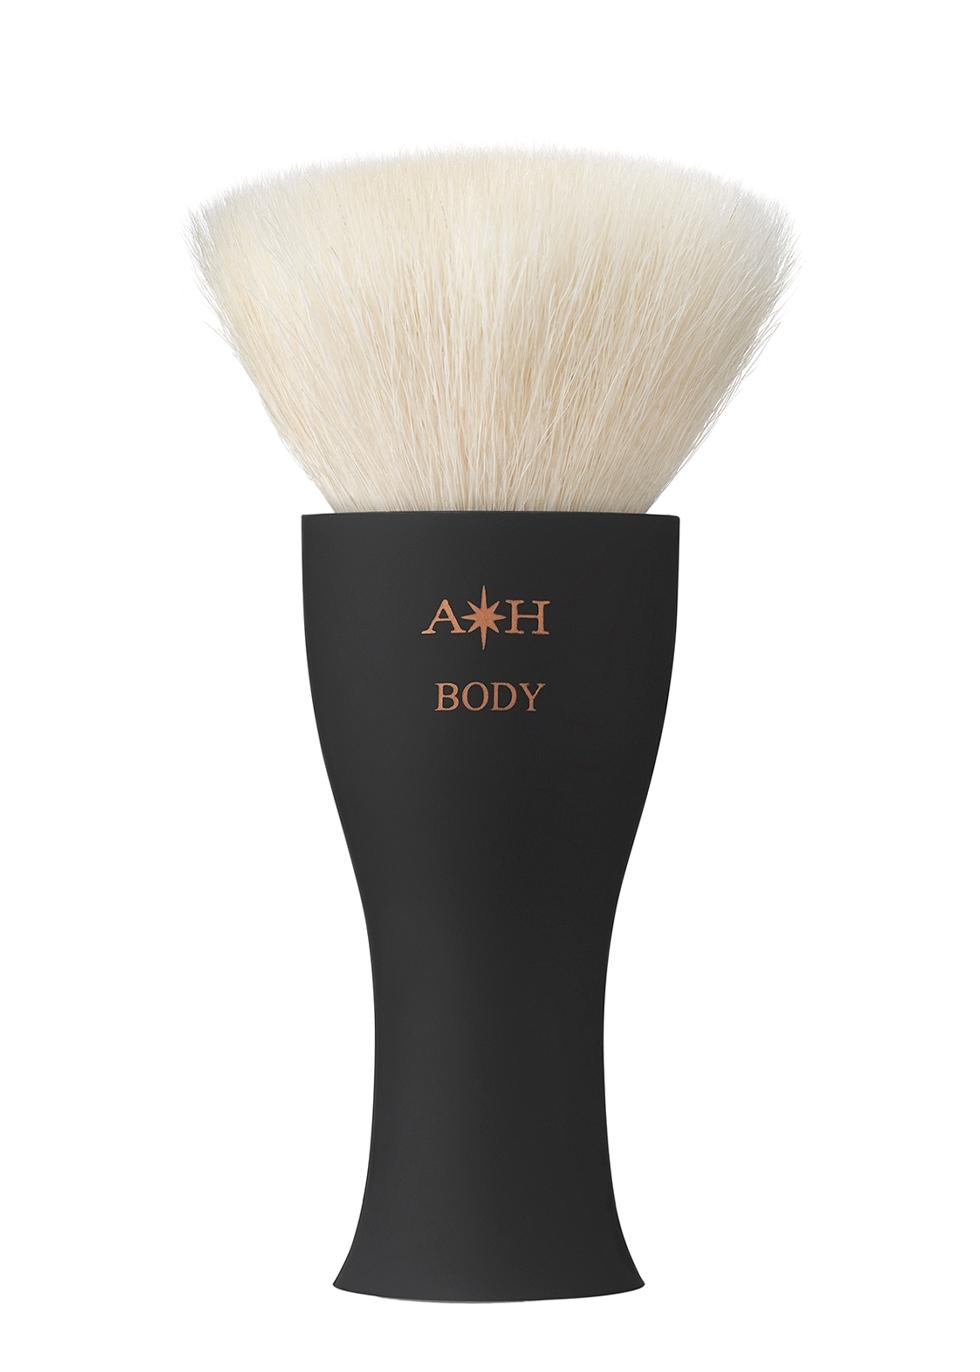 The Small Body Brush